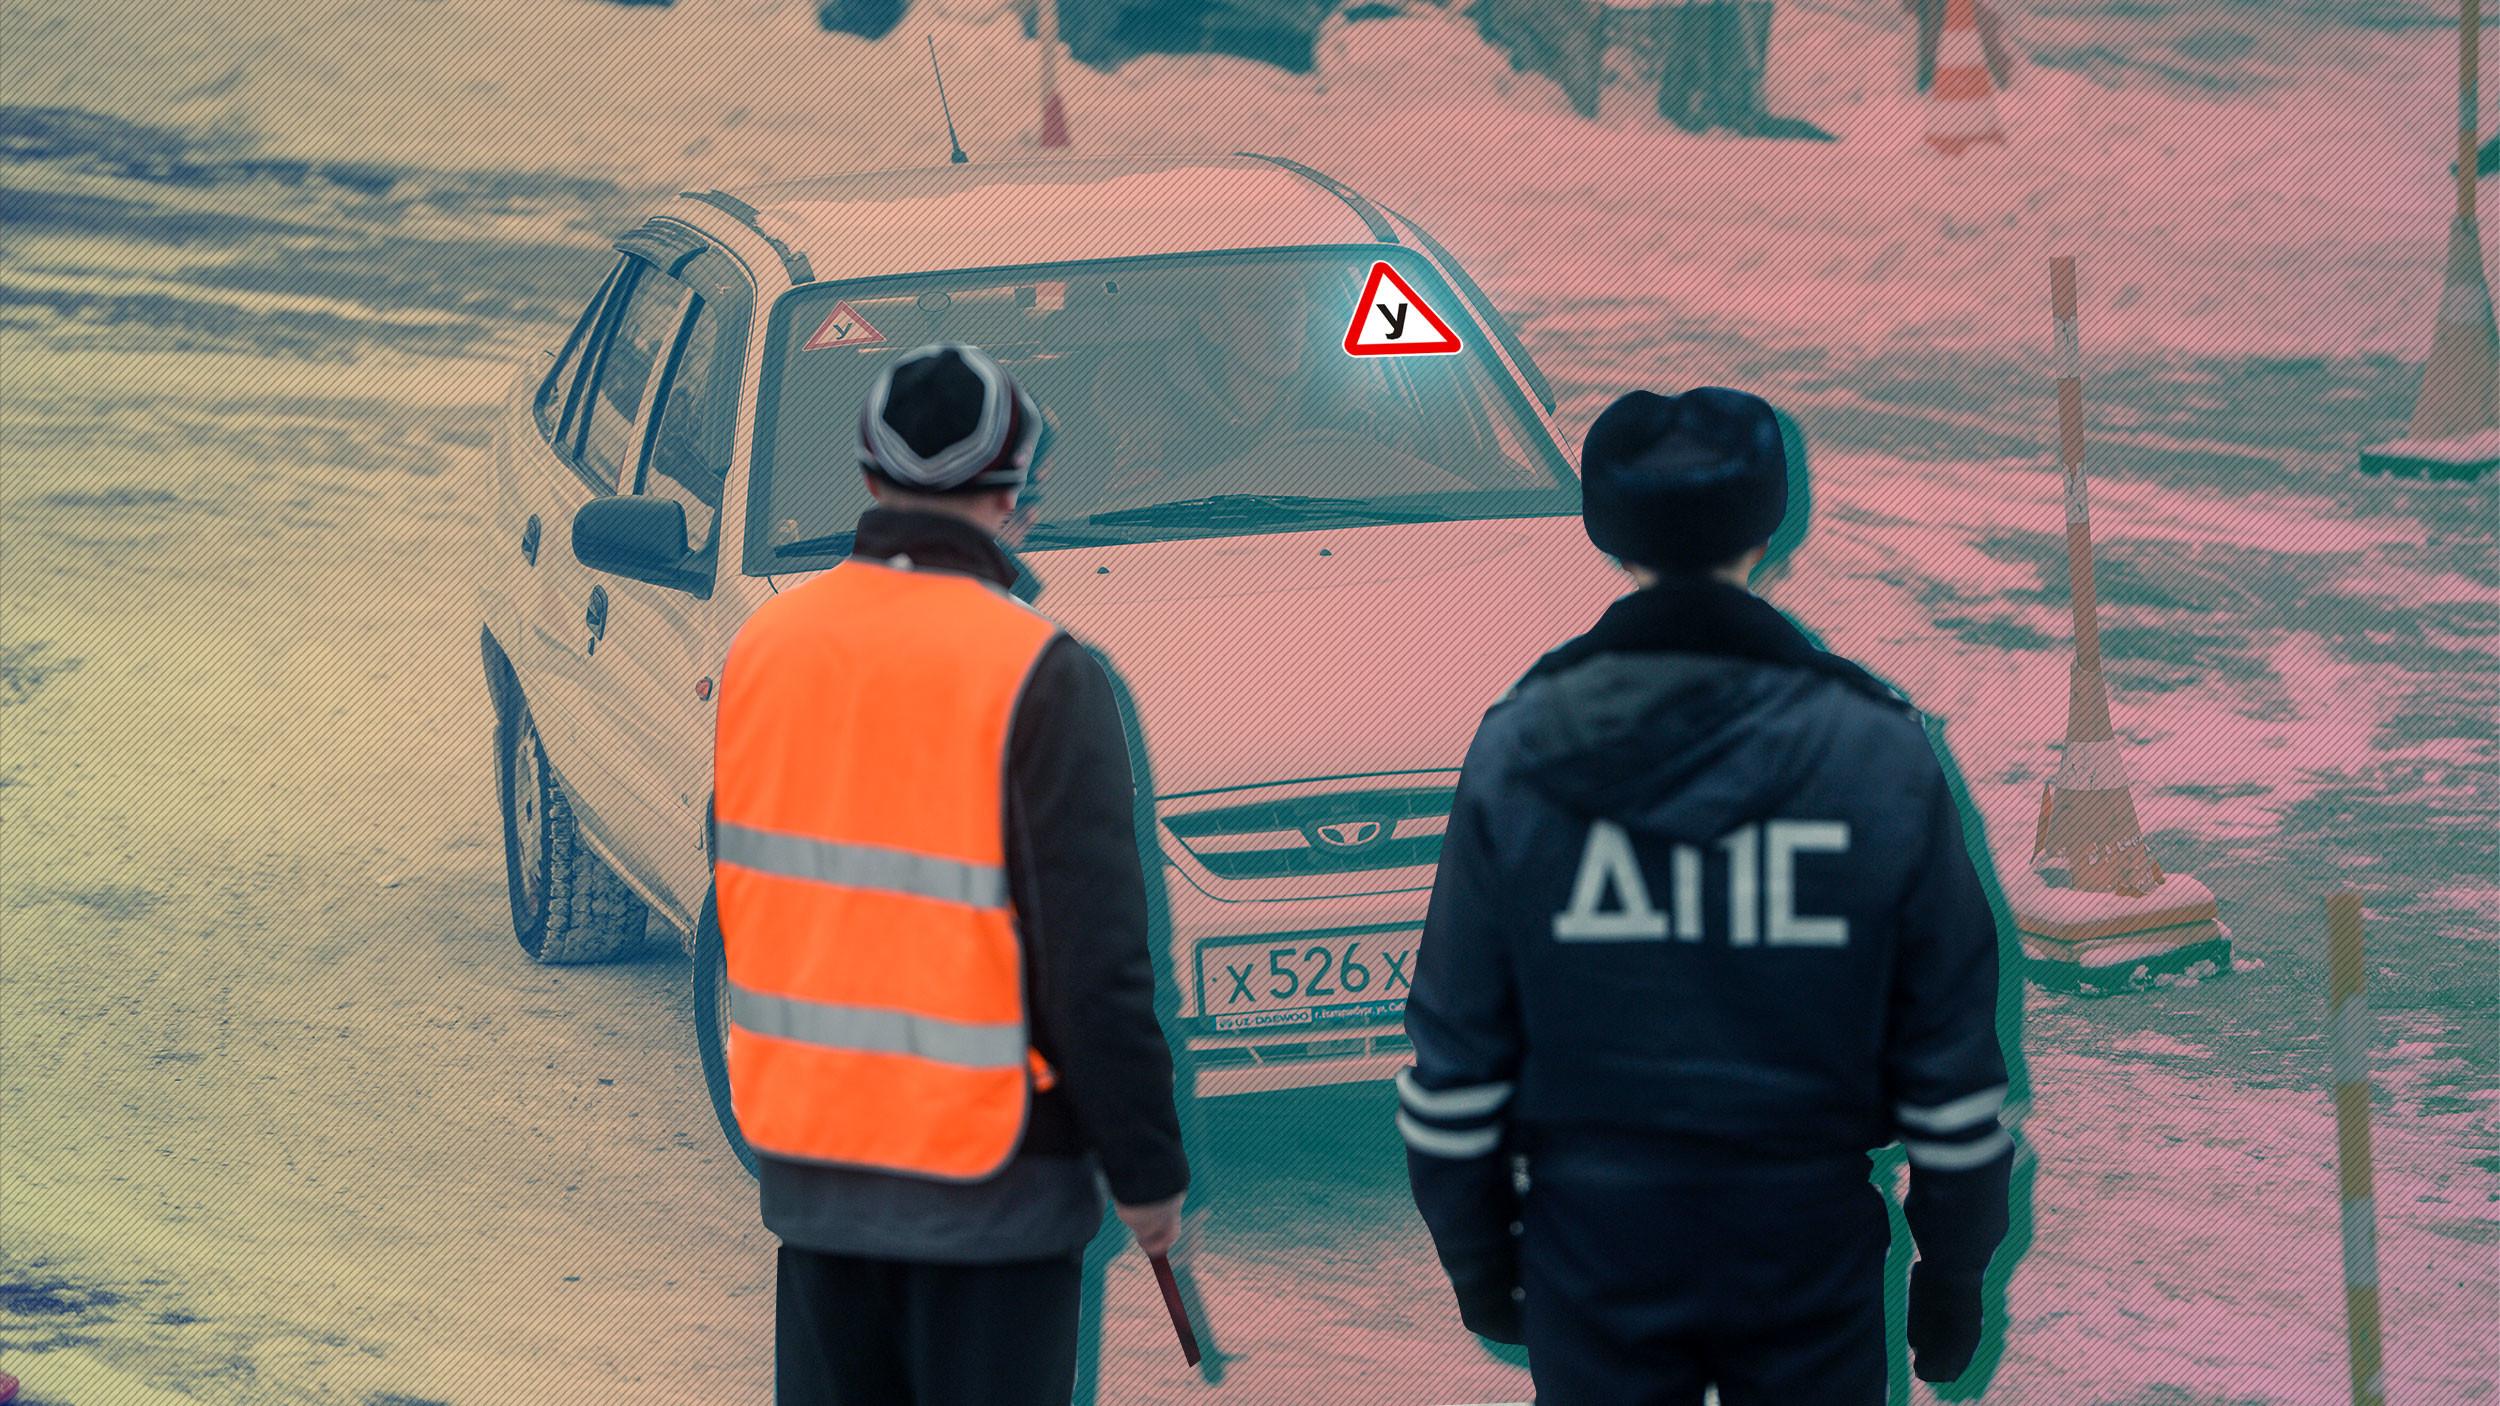 <p><span>Фото: &copy; РИА Новости/Павел Лисицын</span></p>